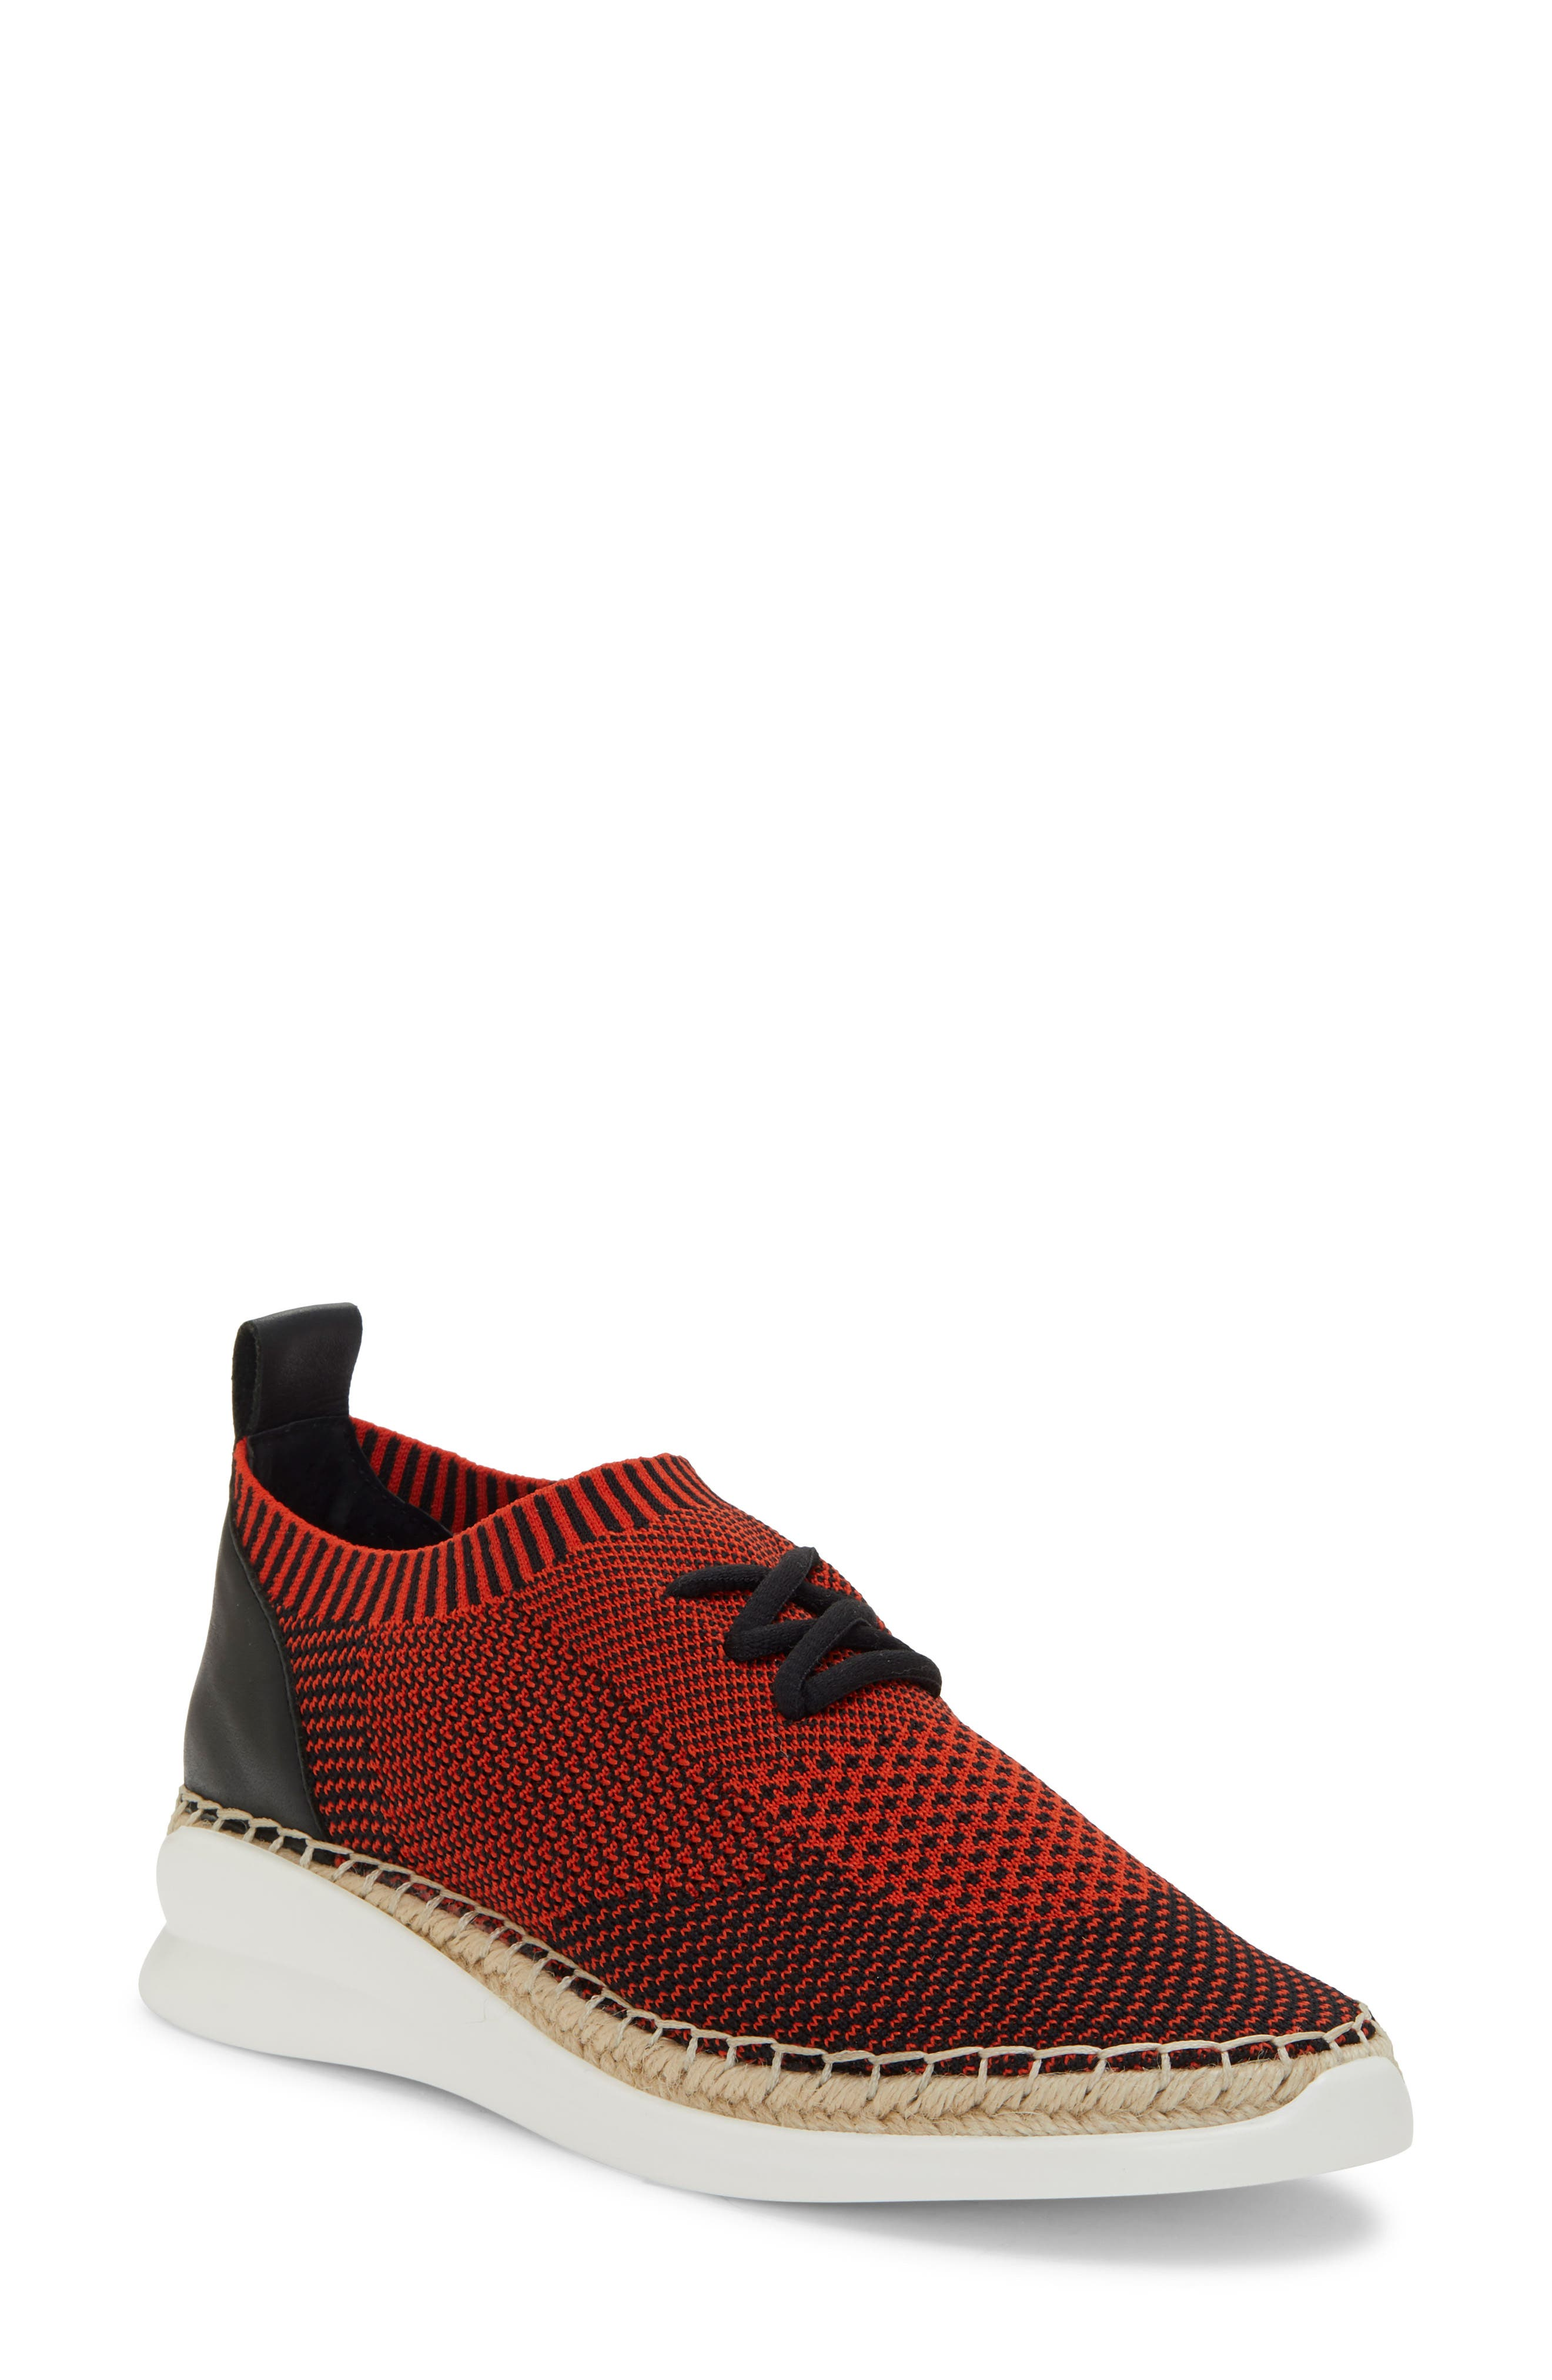 Vince Camuto Affina Sneaker- Red